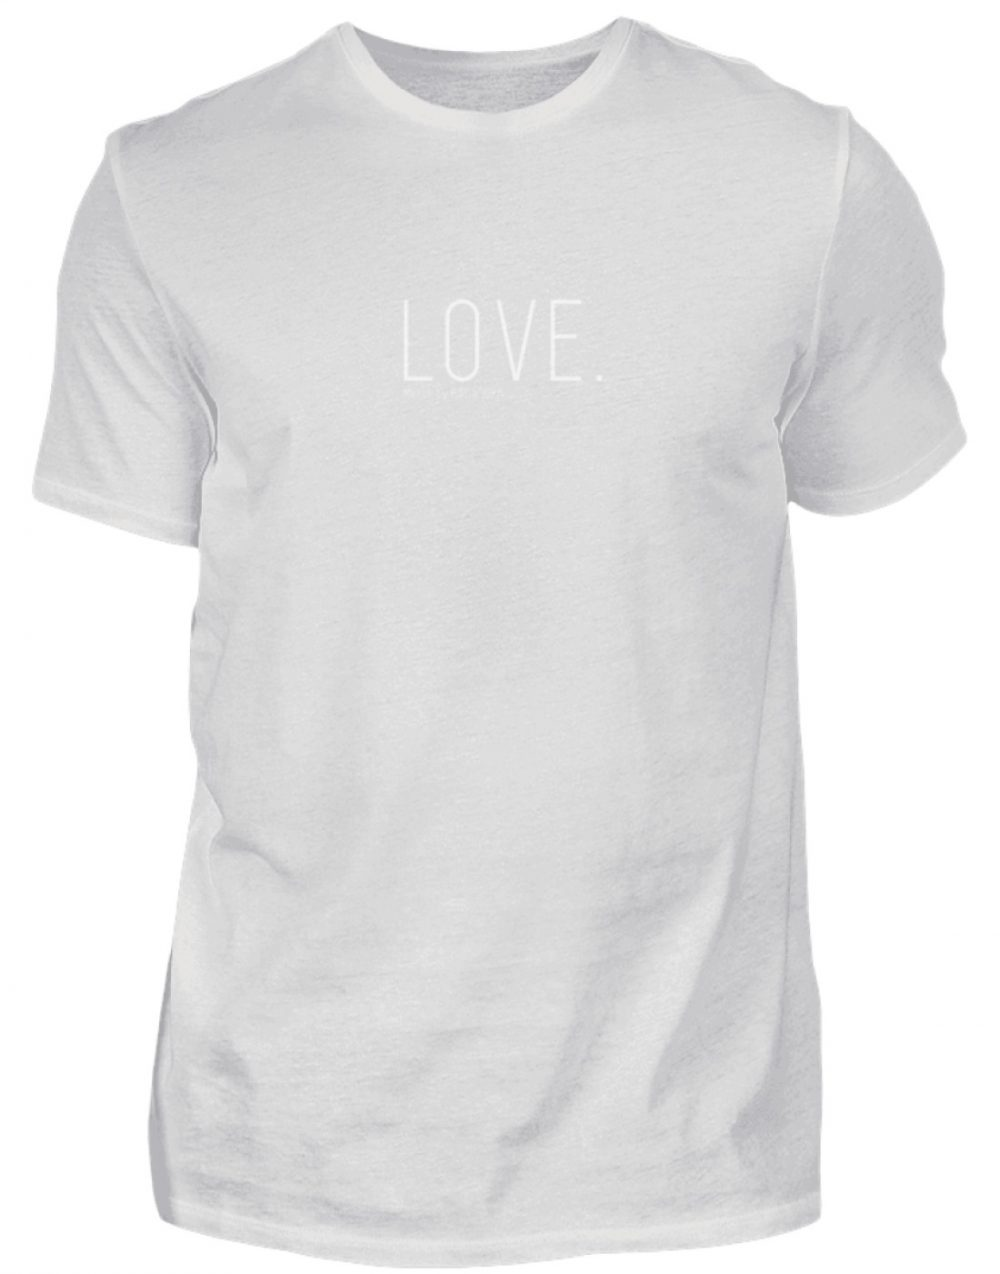 LOVE. - Herren Premiumshirt-1053